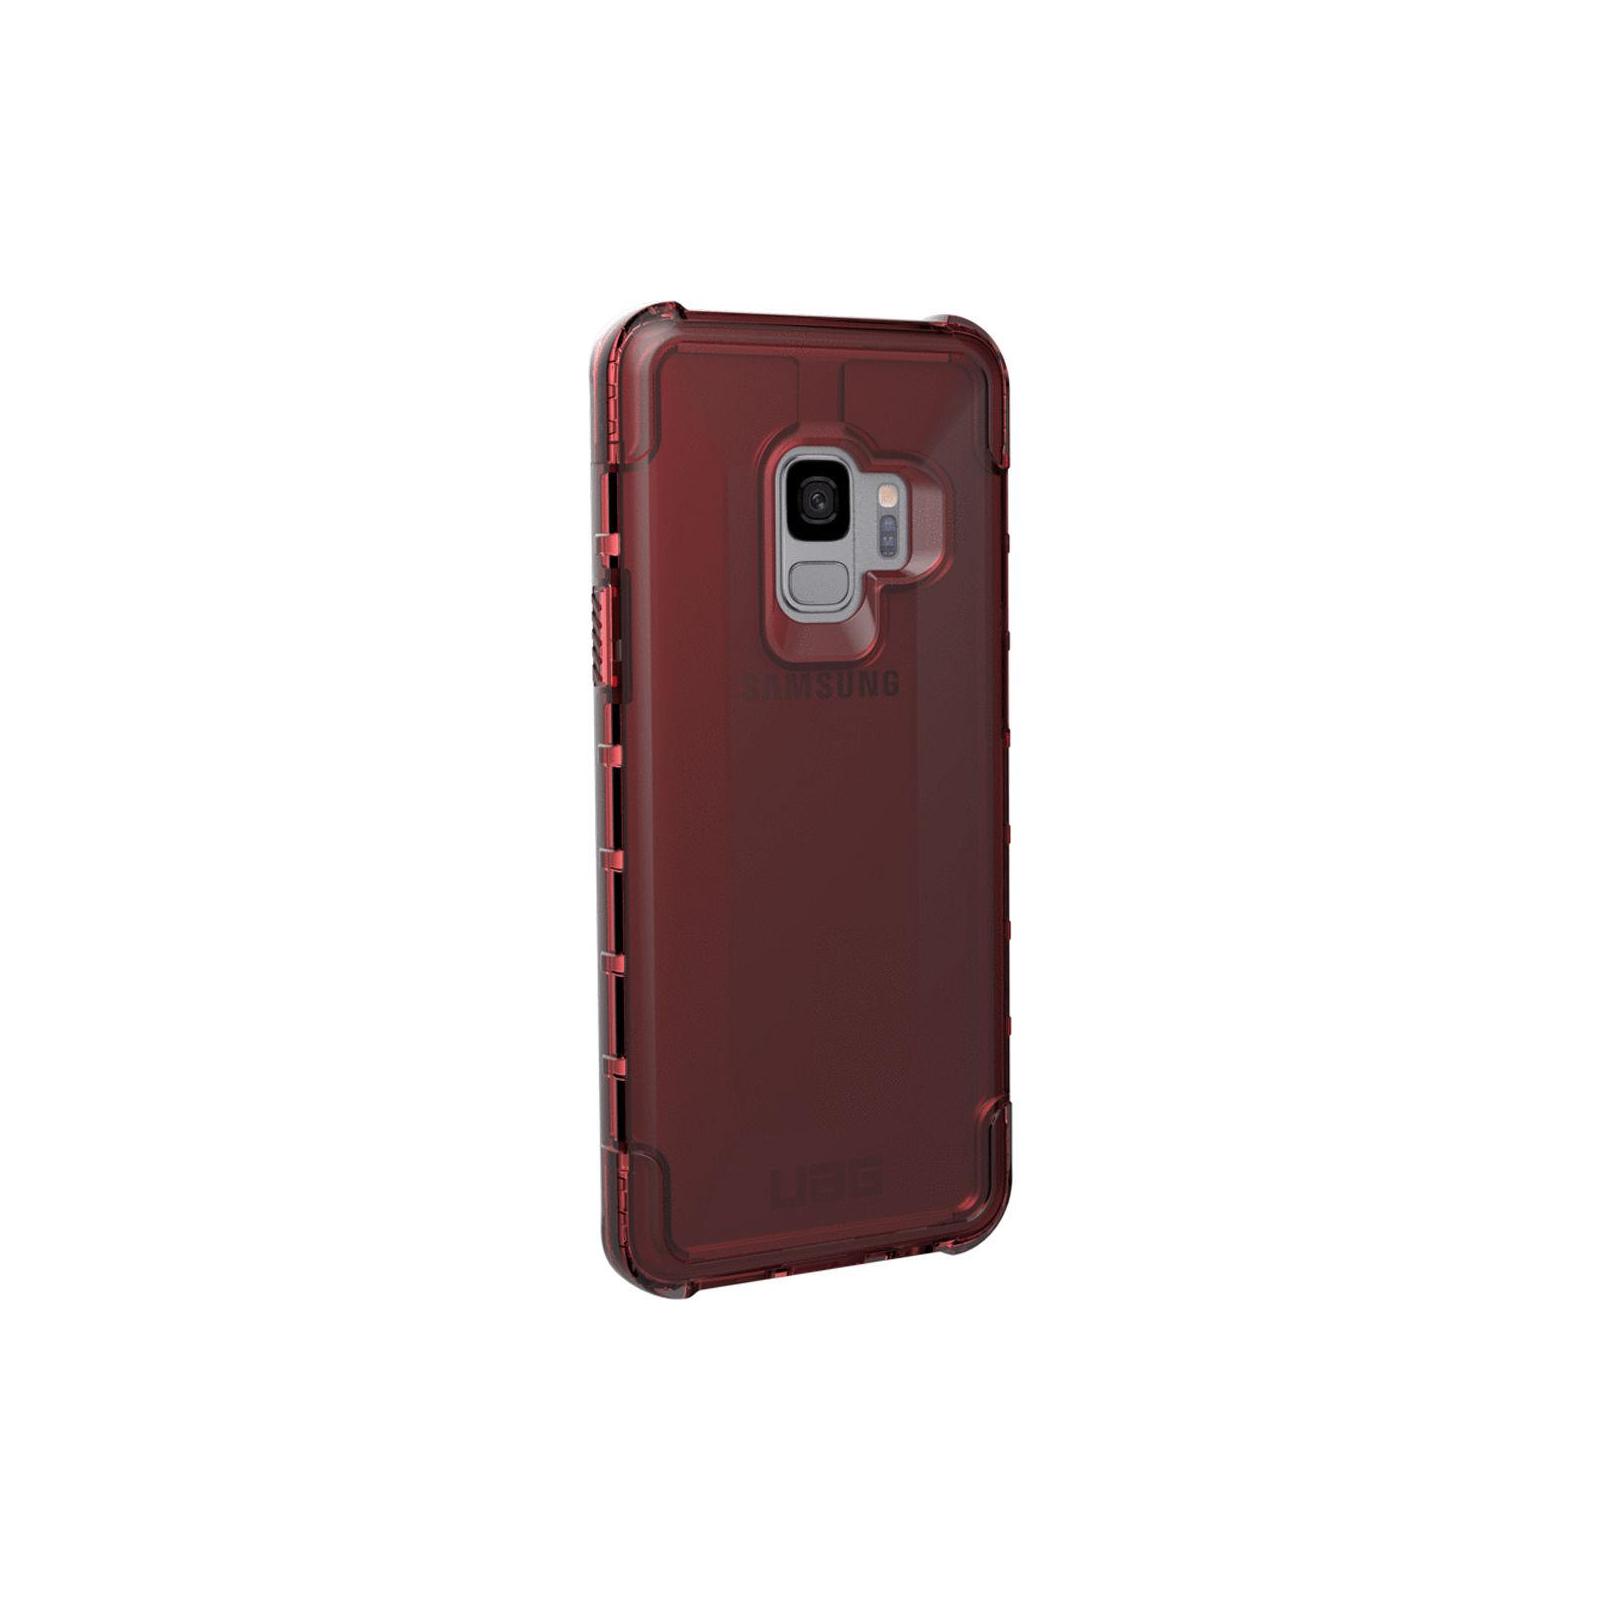 Чехол для моб. телефона Urban Armor Gear Galaxy S9 Plyo Case Crimson (GLXS9-Y-CR) изображение 2